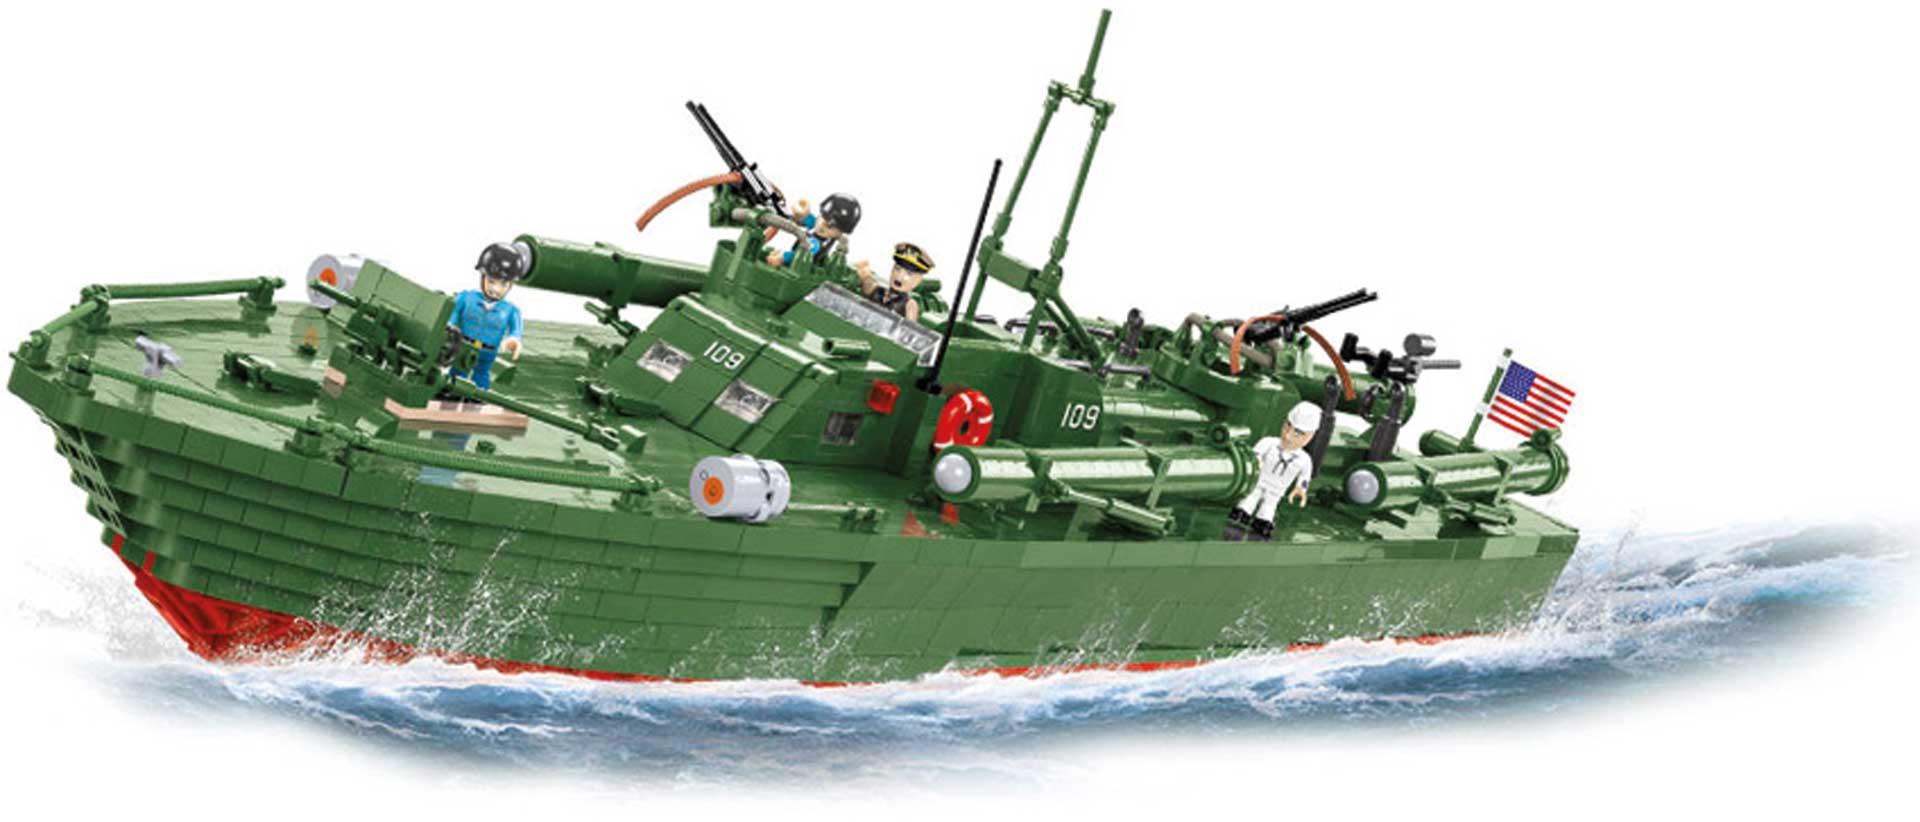 COBI Patrol Torpedo Boat PT-109 (3726 Teile)